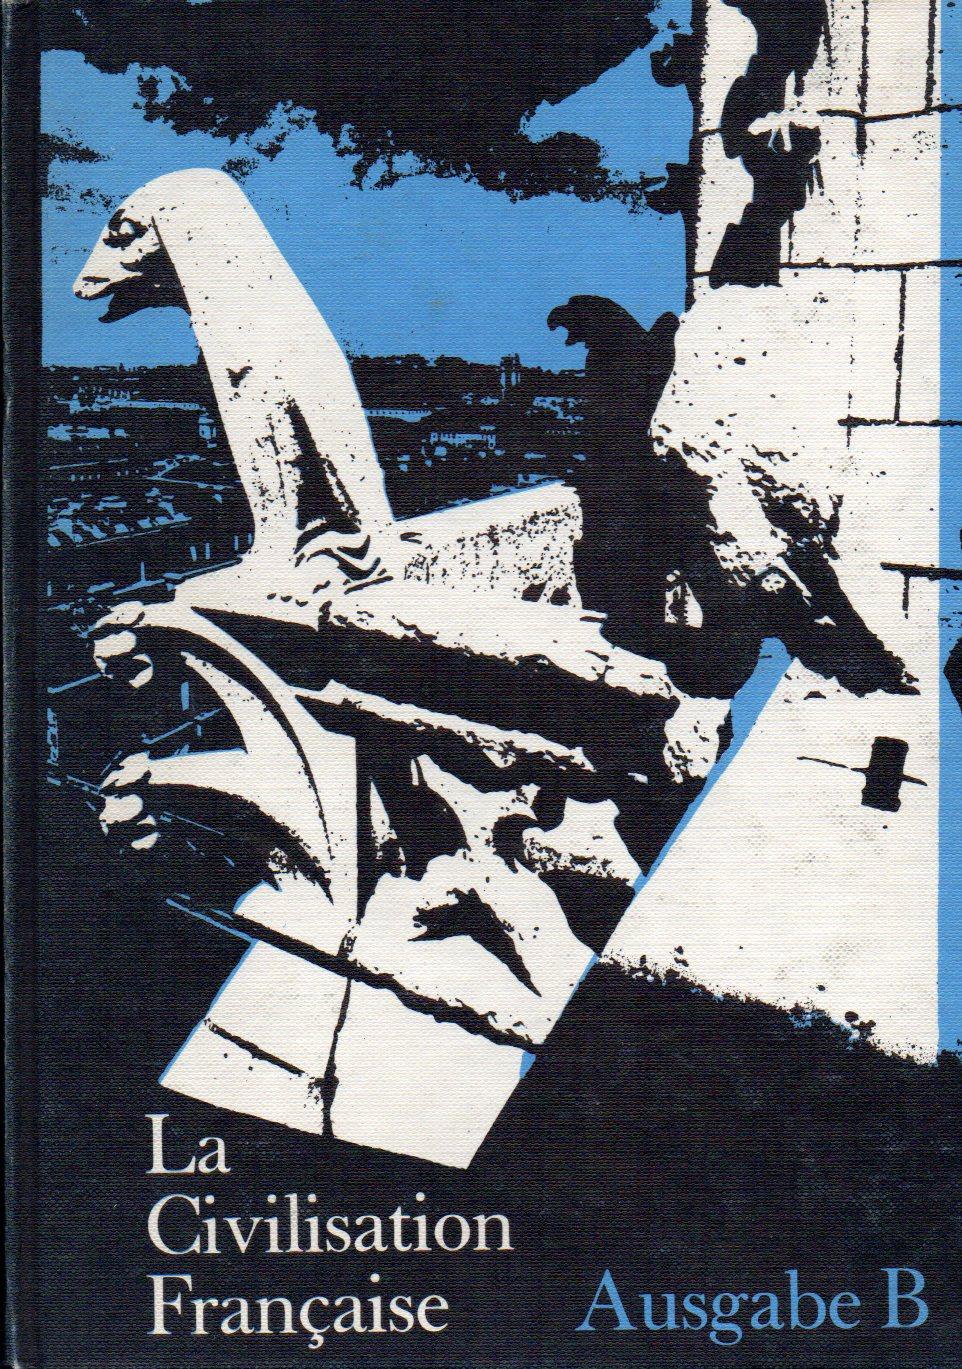 Ausgabe C1 La Civilisation Francaise Hertel Werner: